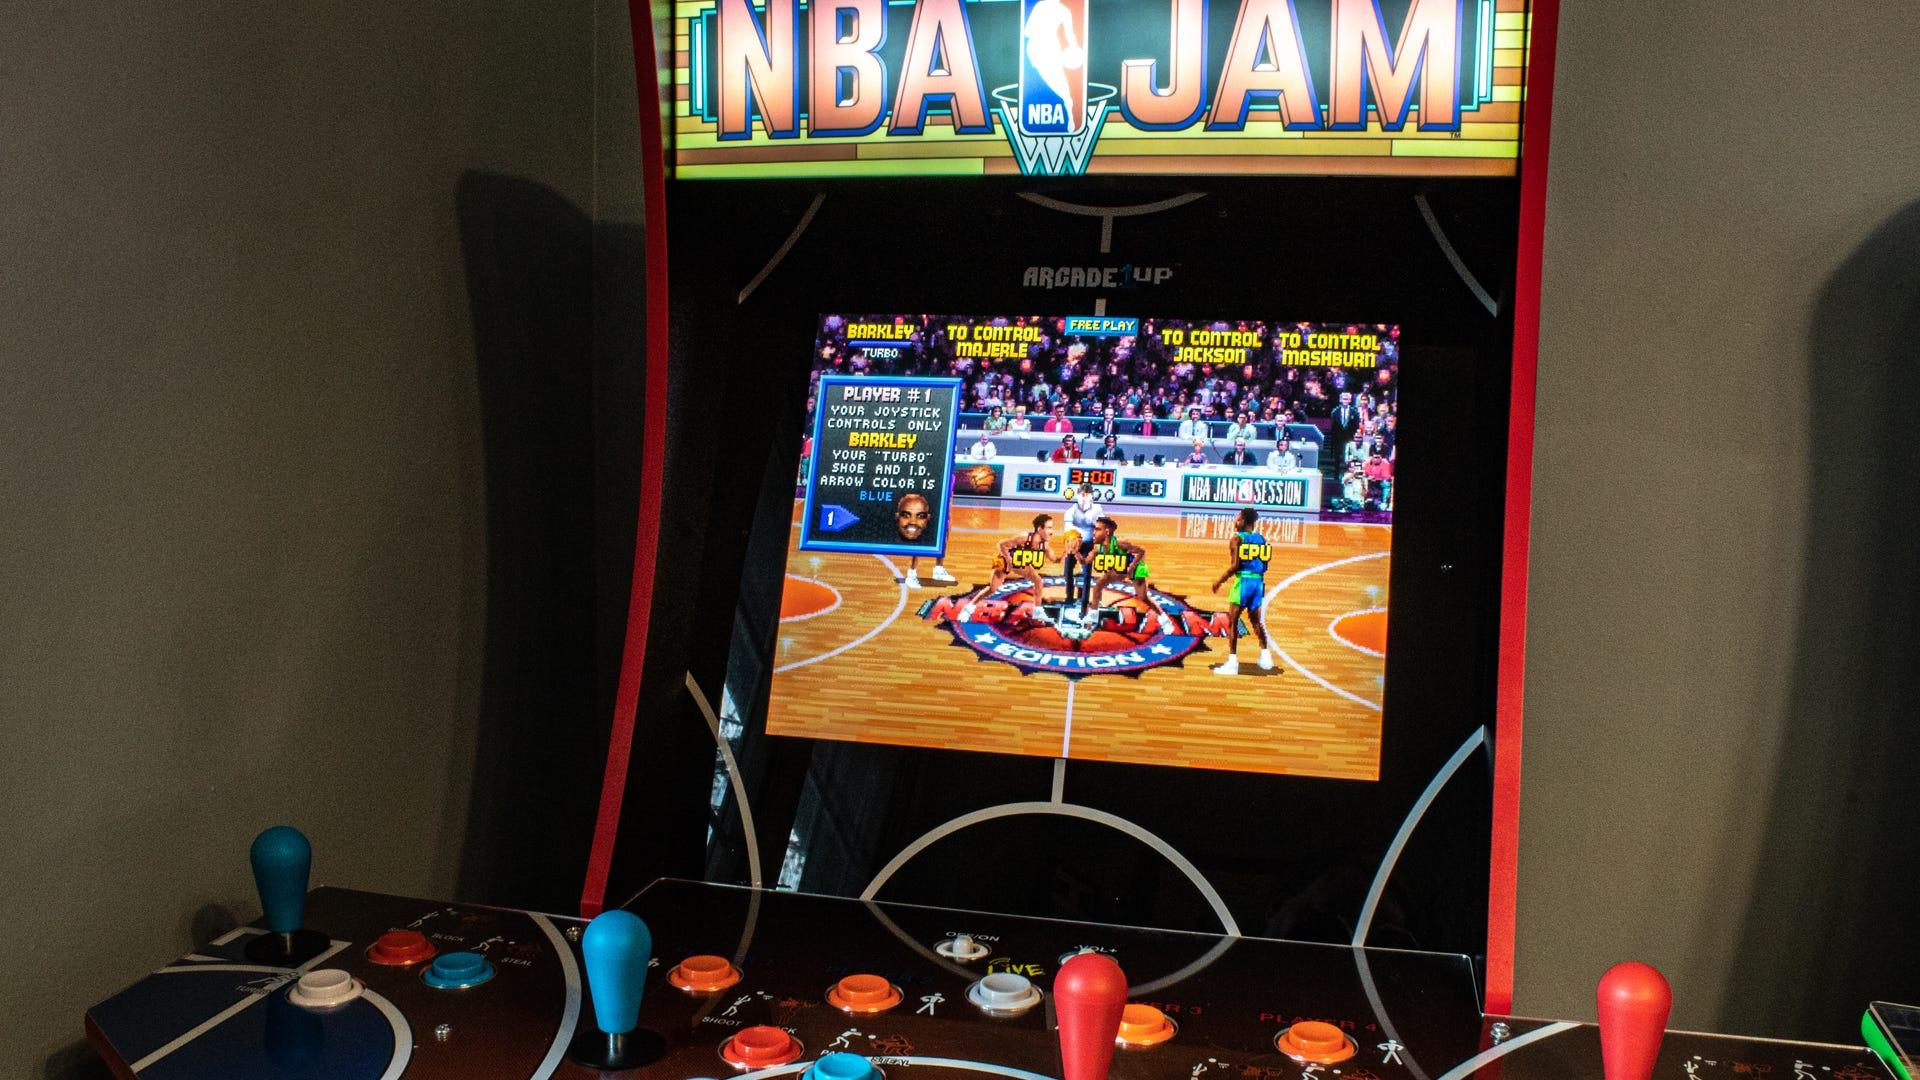 A closeup shot of the NBA Jam machine playing a game.